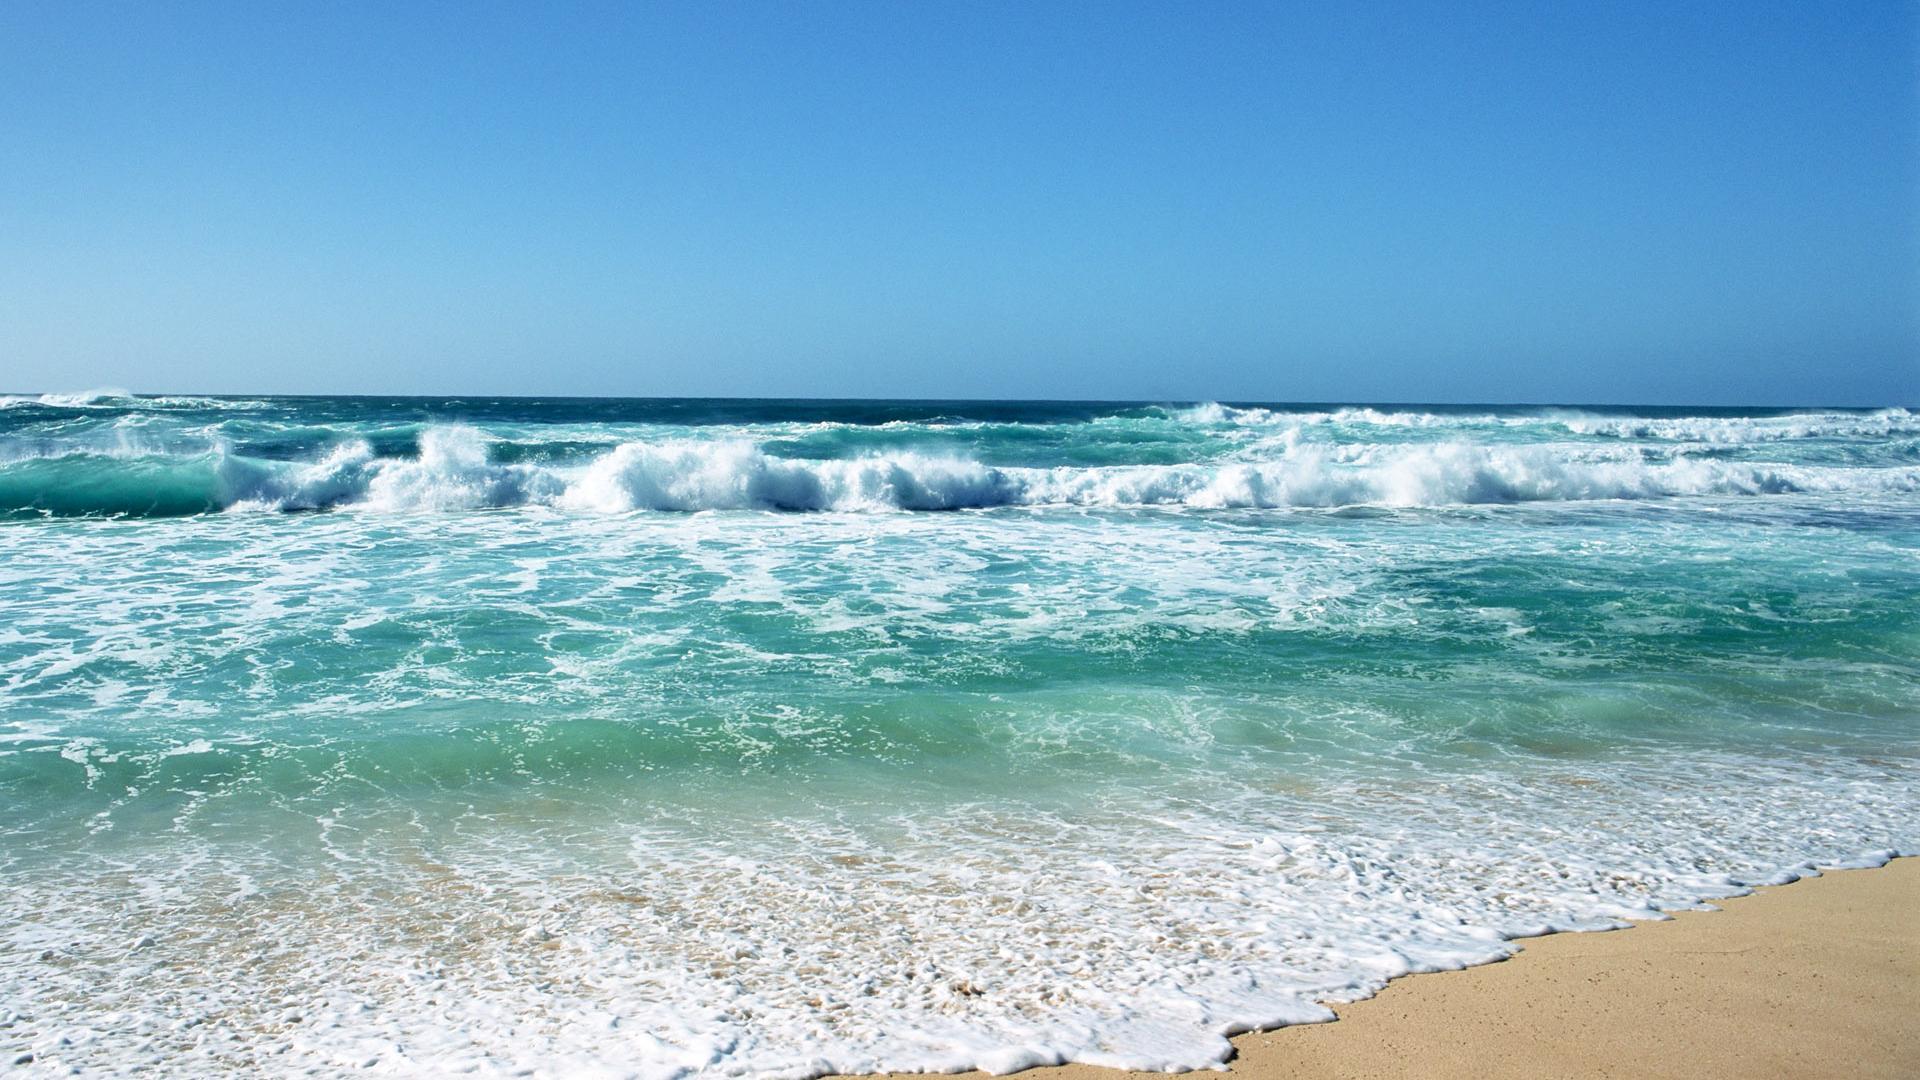 backgrounds beautiful sea beach desktop background stormy blue 1920x1080